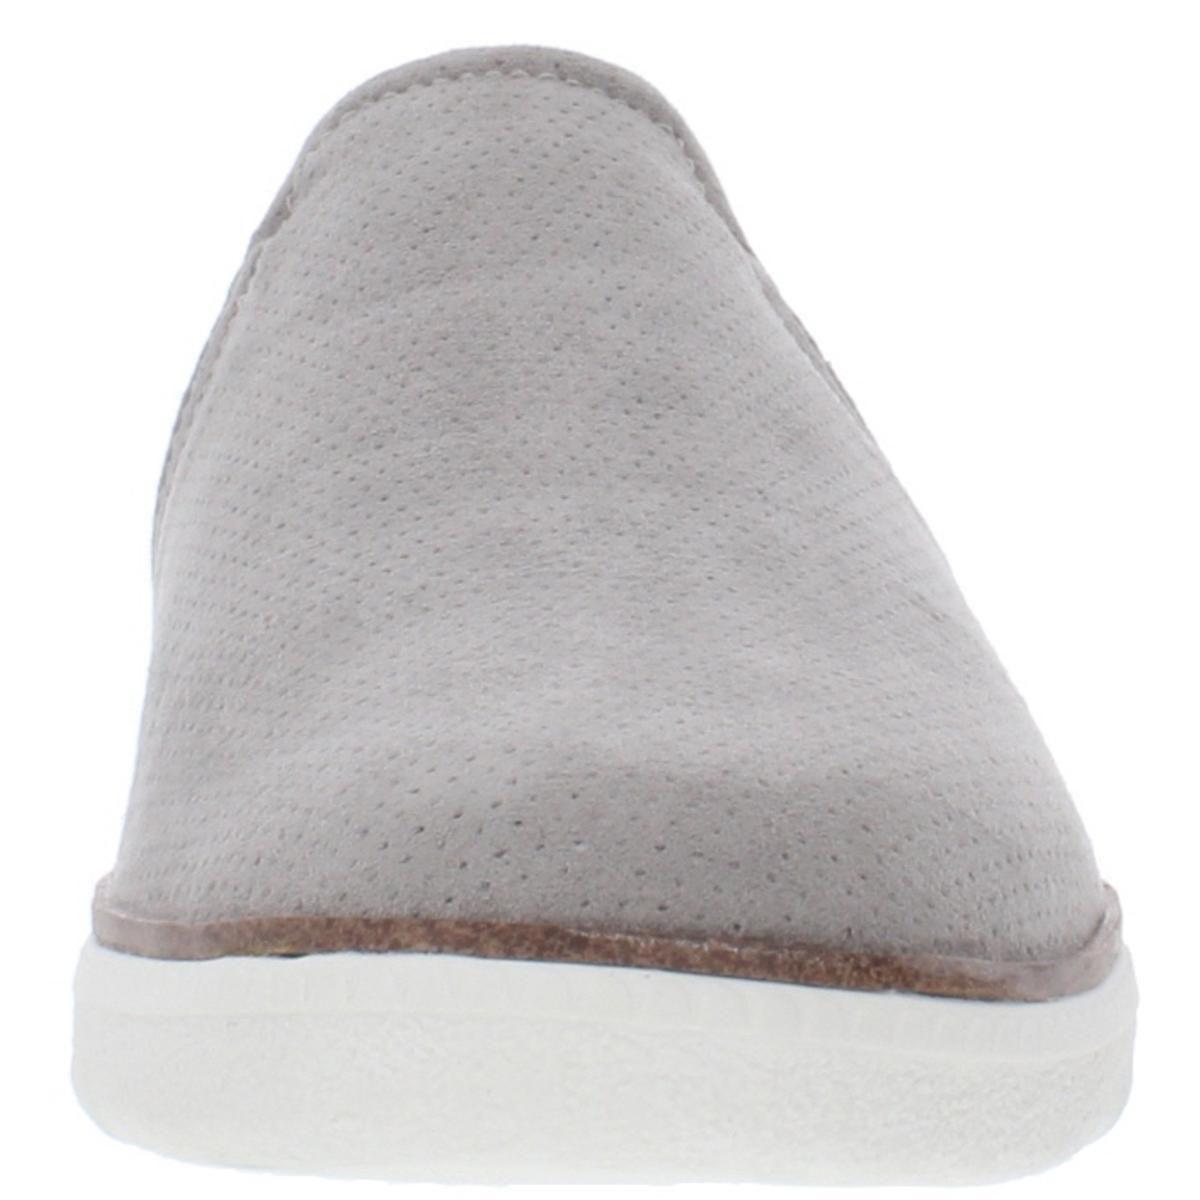 Dr. Scholl's Womens Slip-On Sneakers Gray Size 7 Medium (B,M)